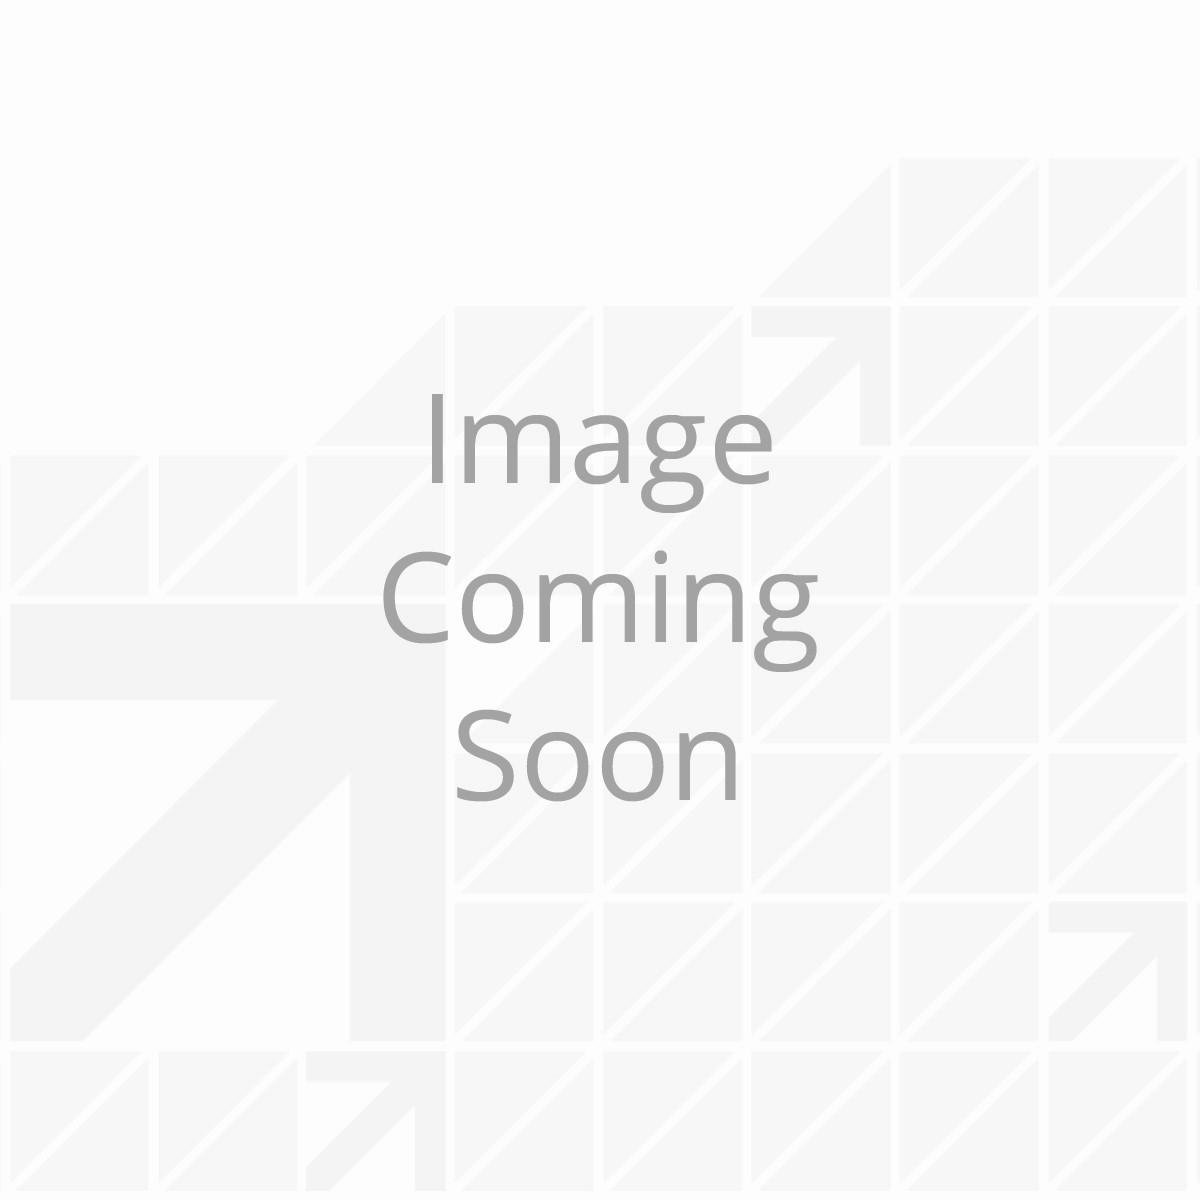 Awnbrella™ Label